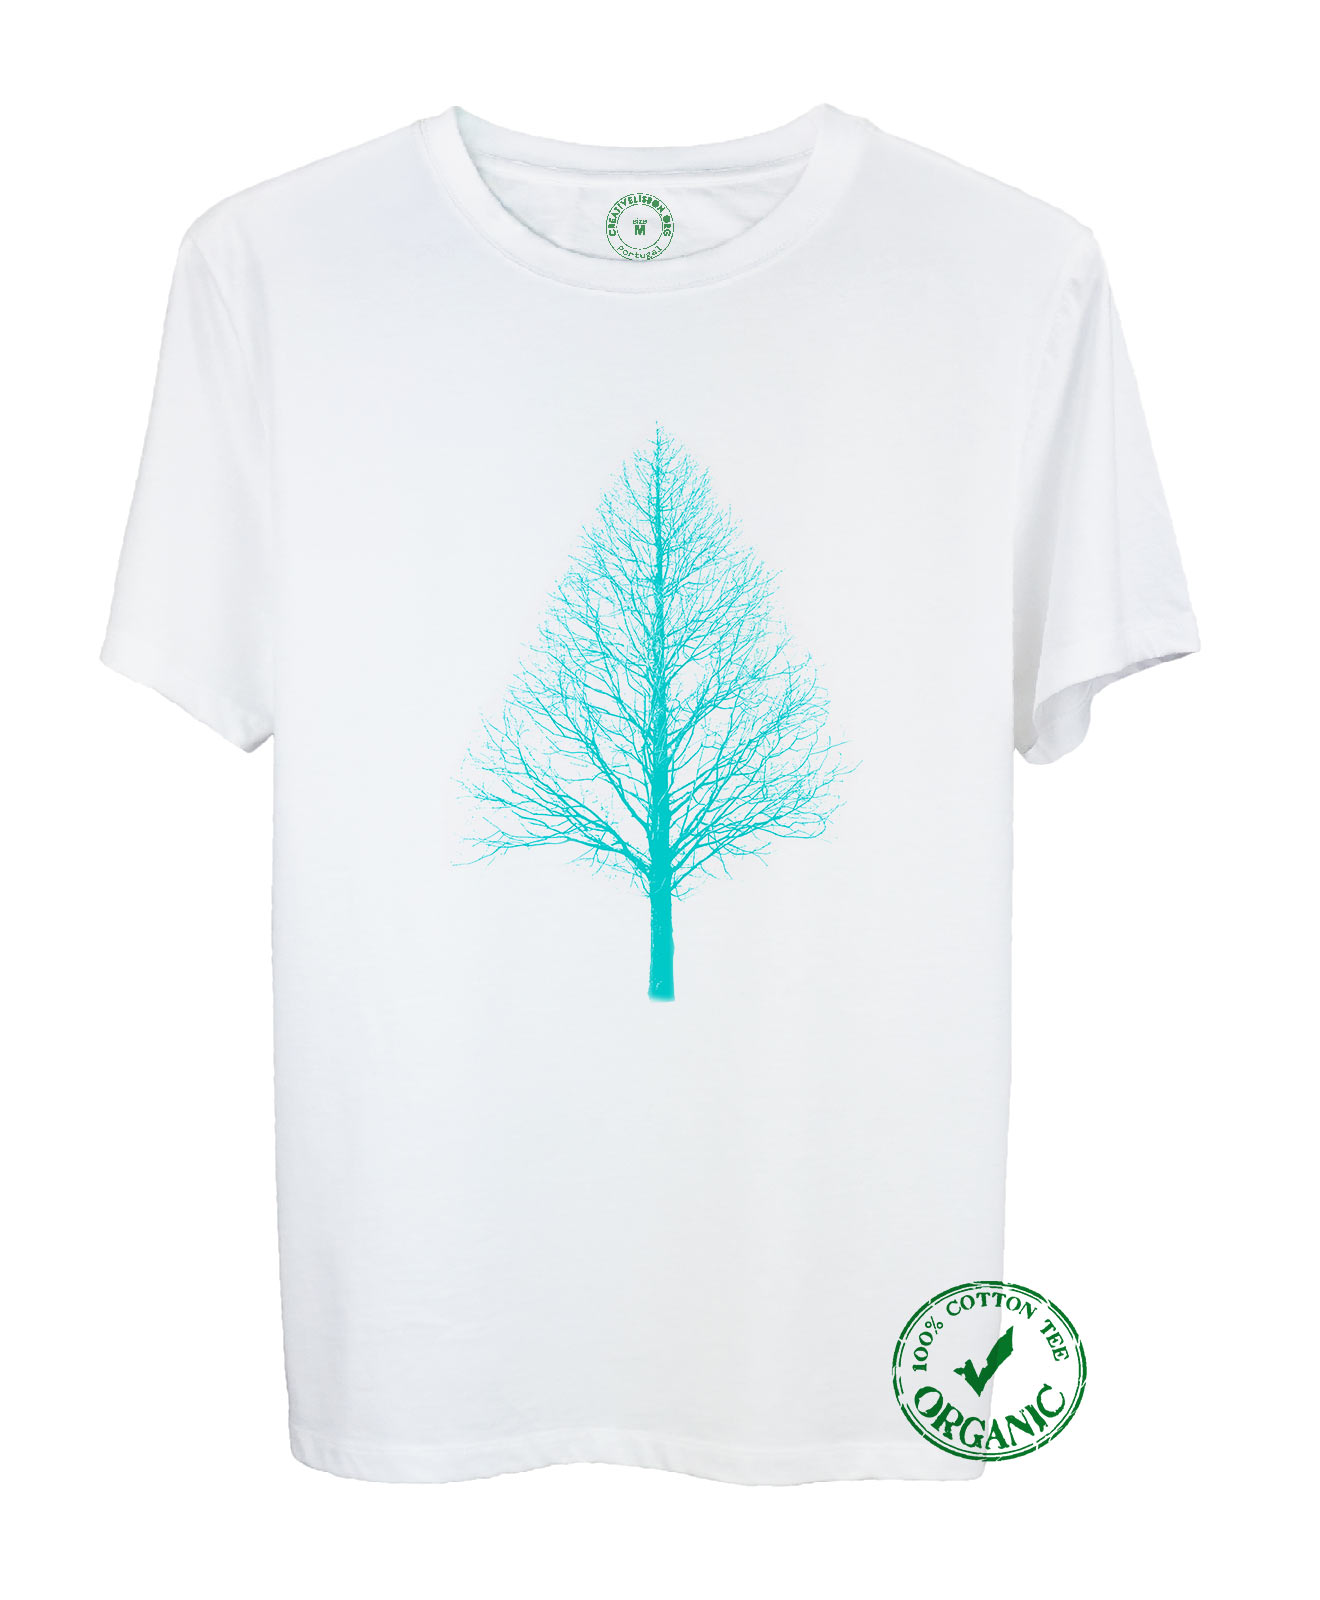 Pyramid Tree Organic T-shirt